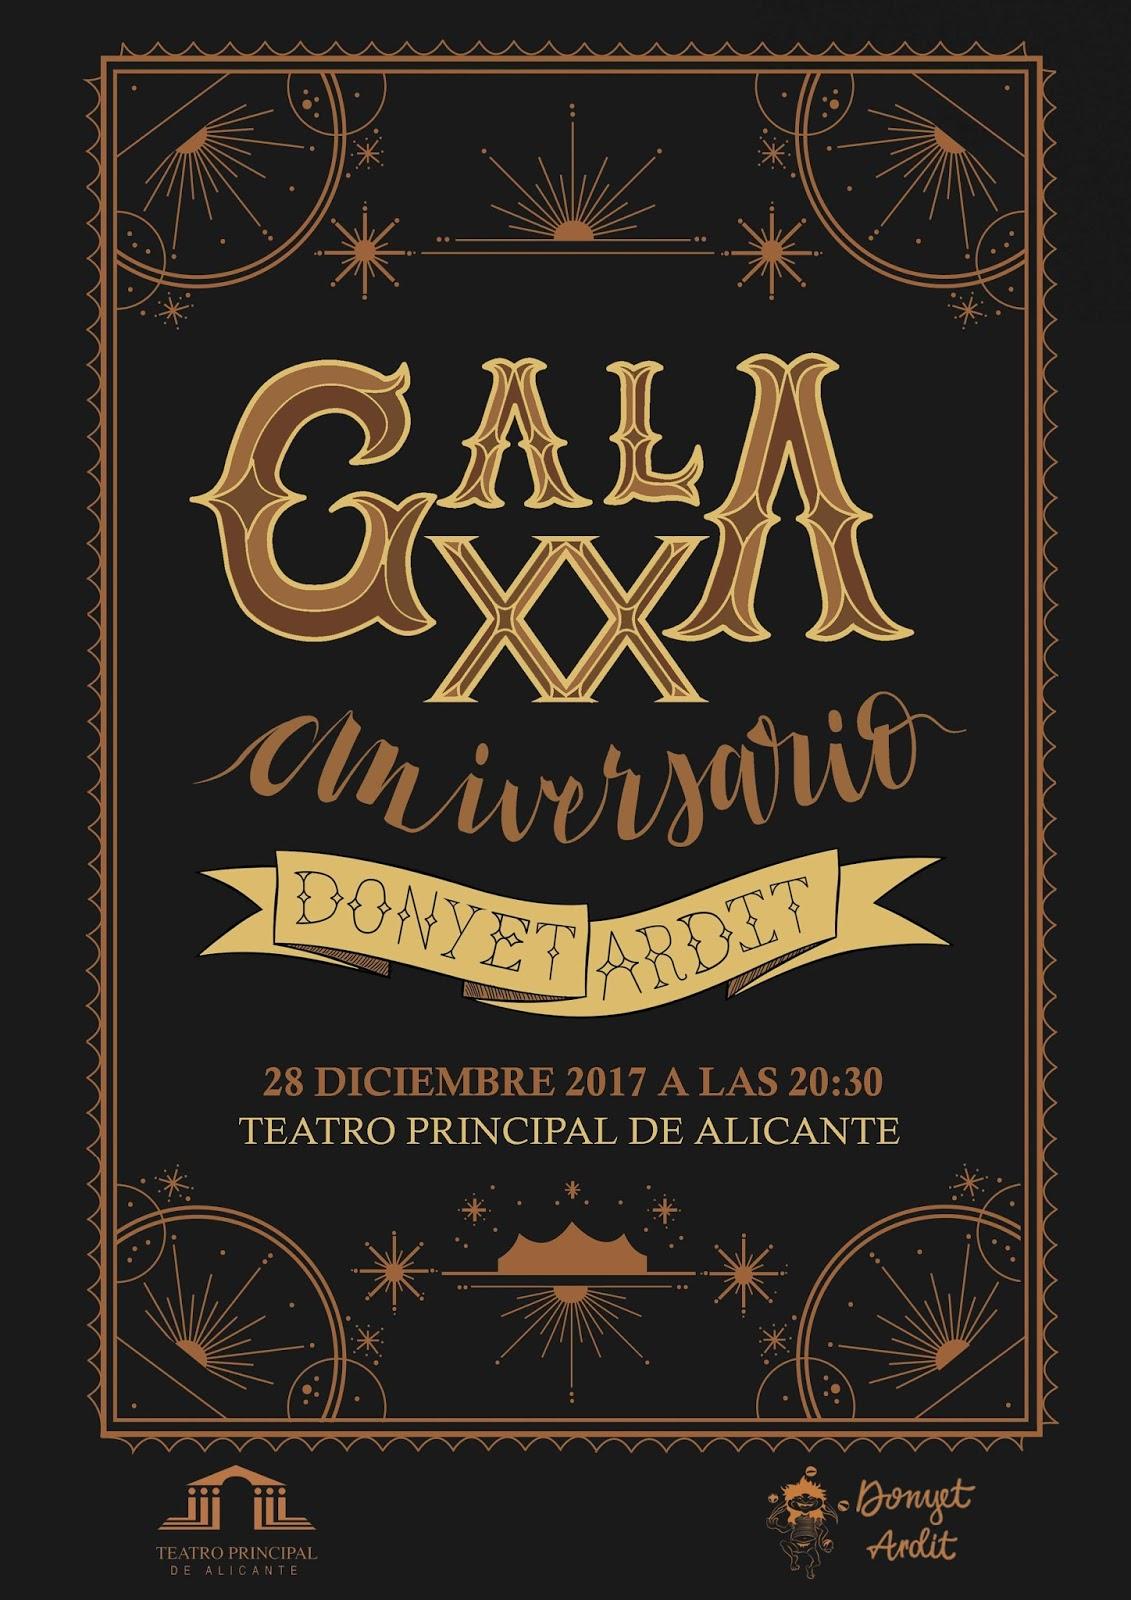 Gala XX Aniversario Donyet Ardit